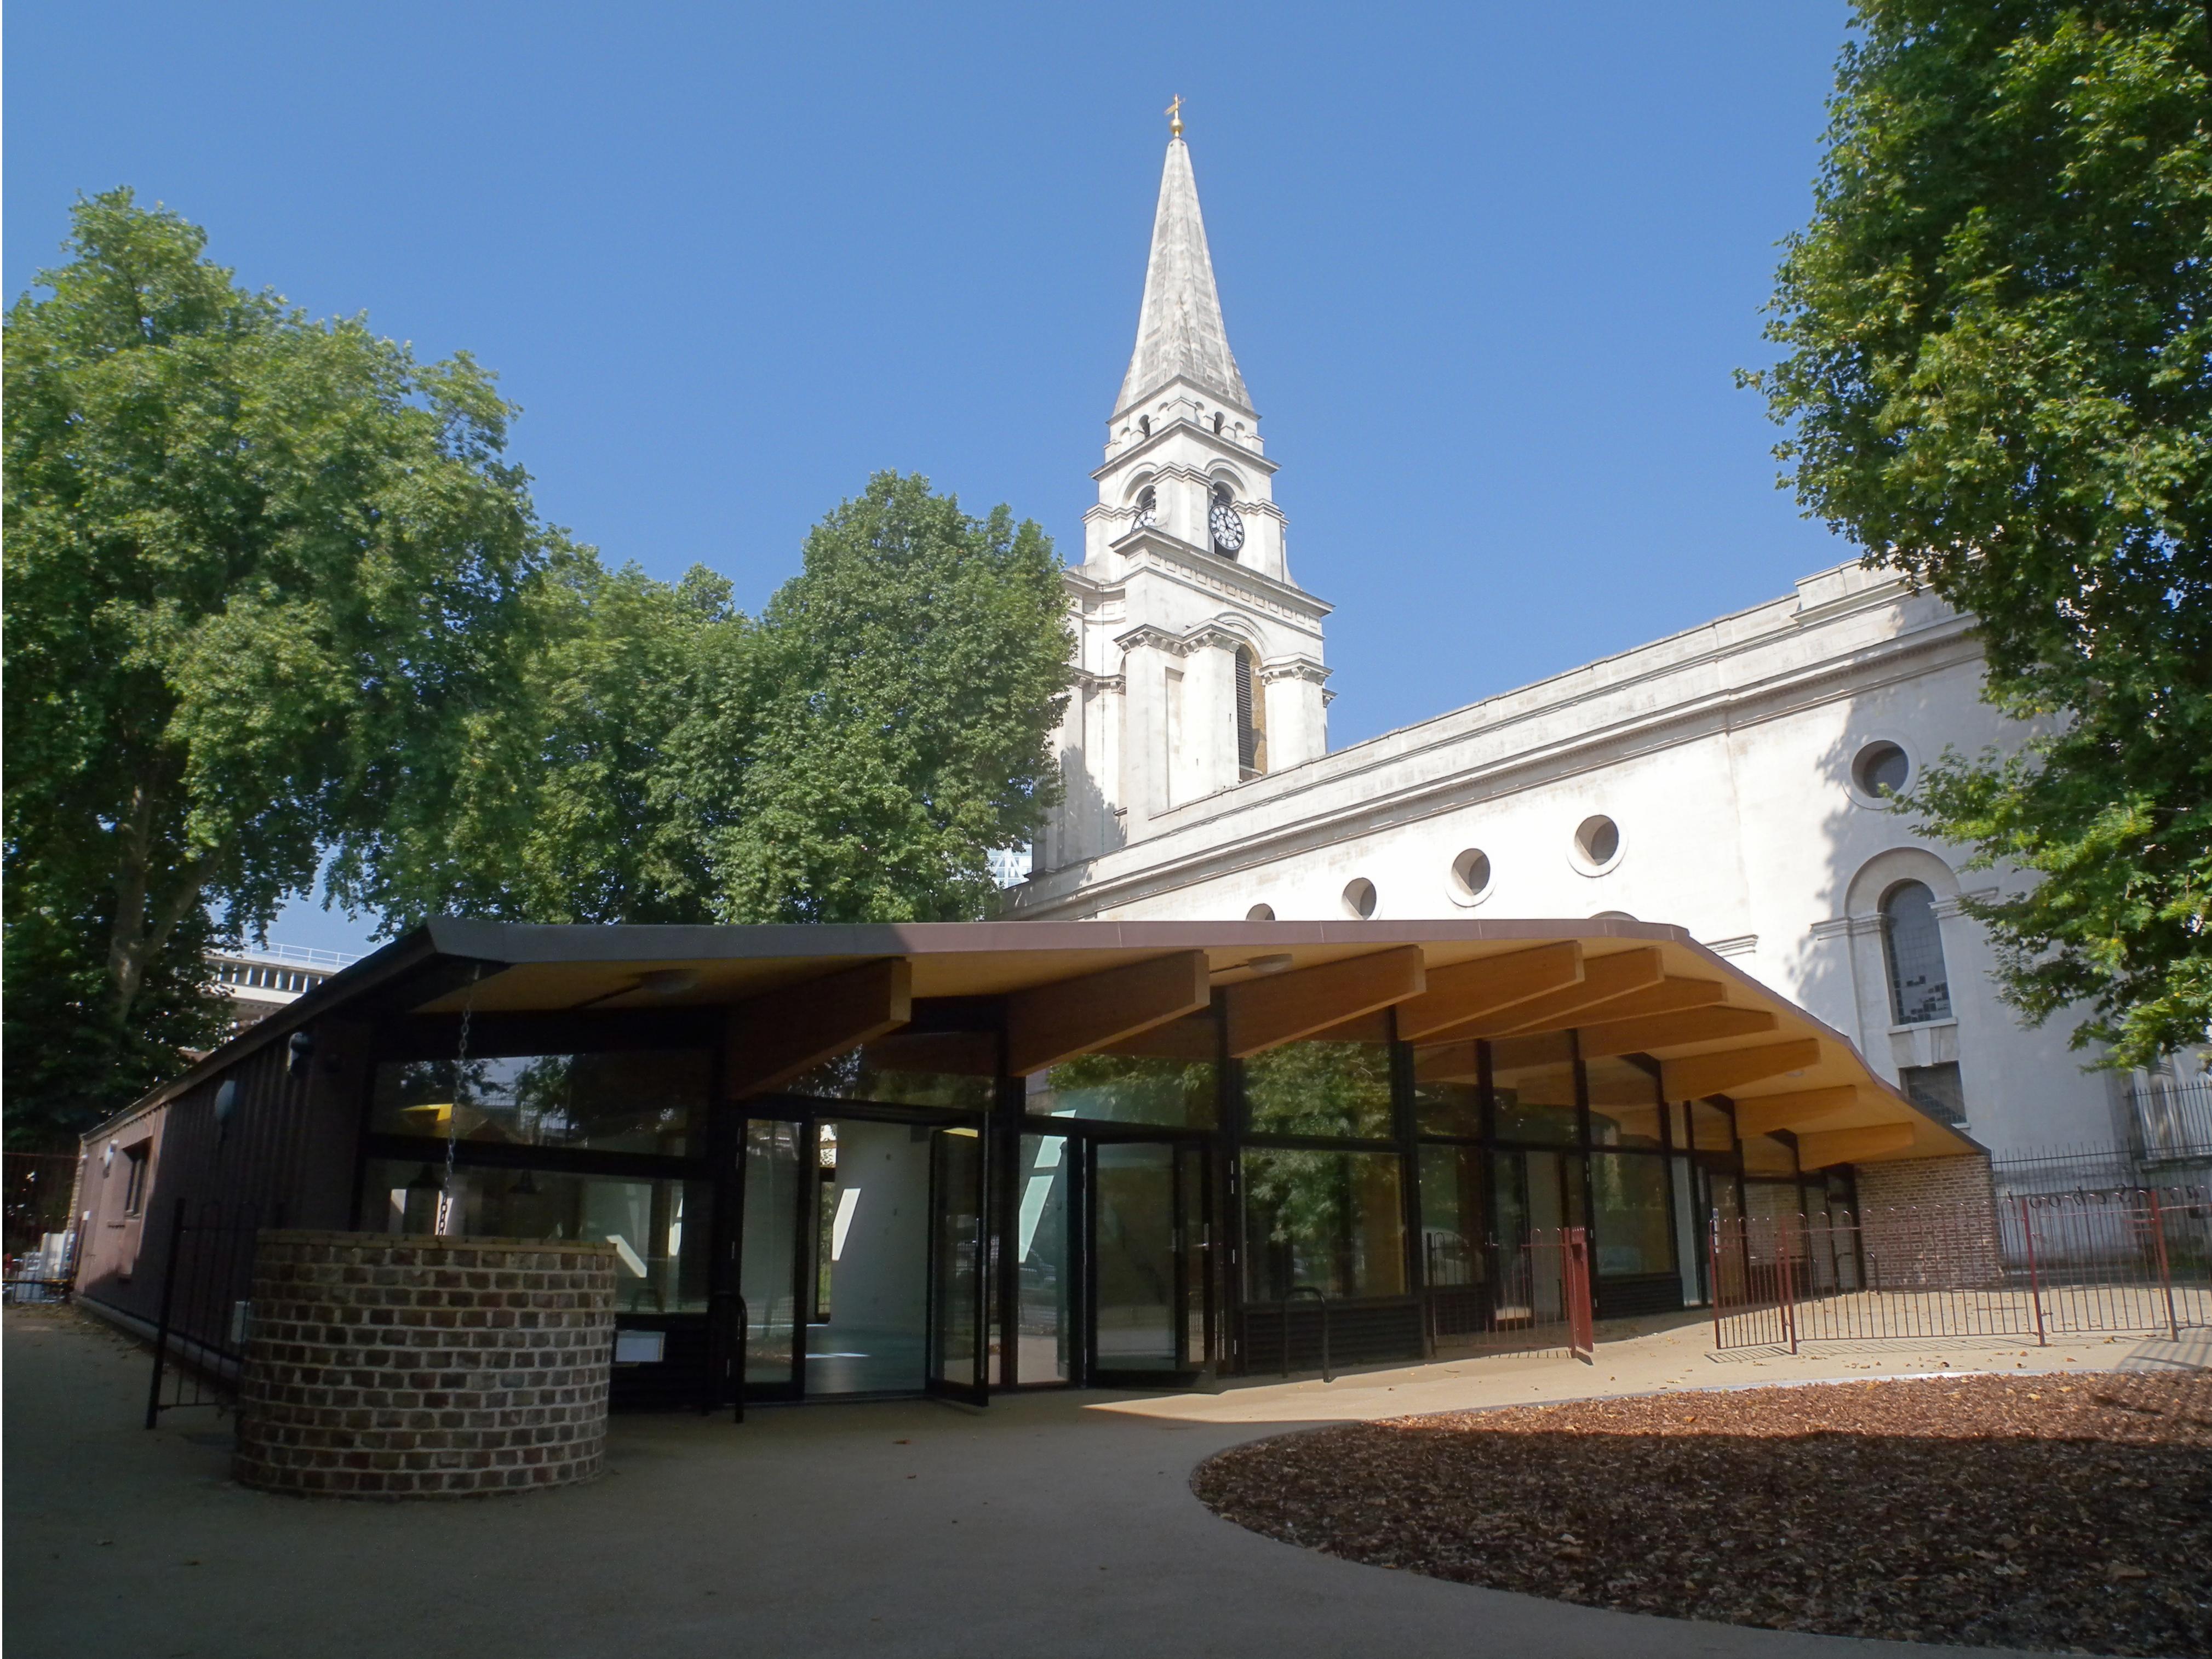 Christ Church Spitalfields New Nursery and Community Building_01.jpg